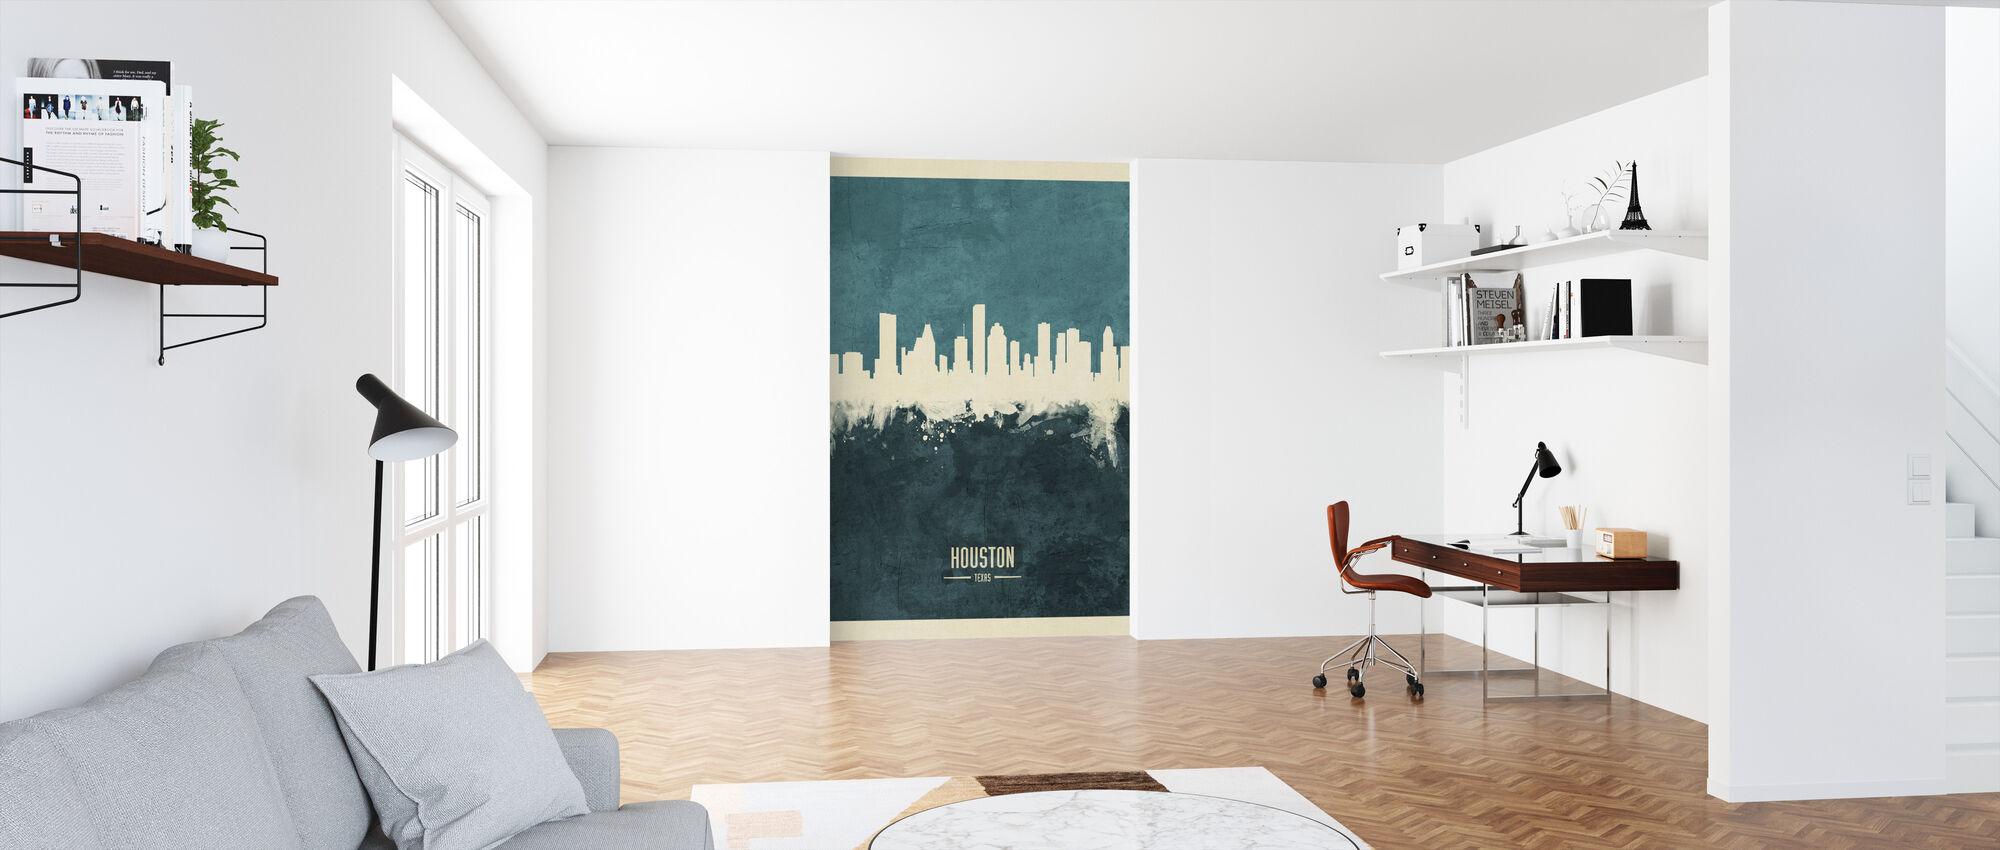 Houston Texas Skyline Blue - Wallpaper - Office